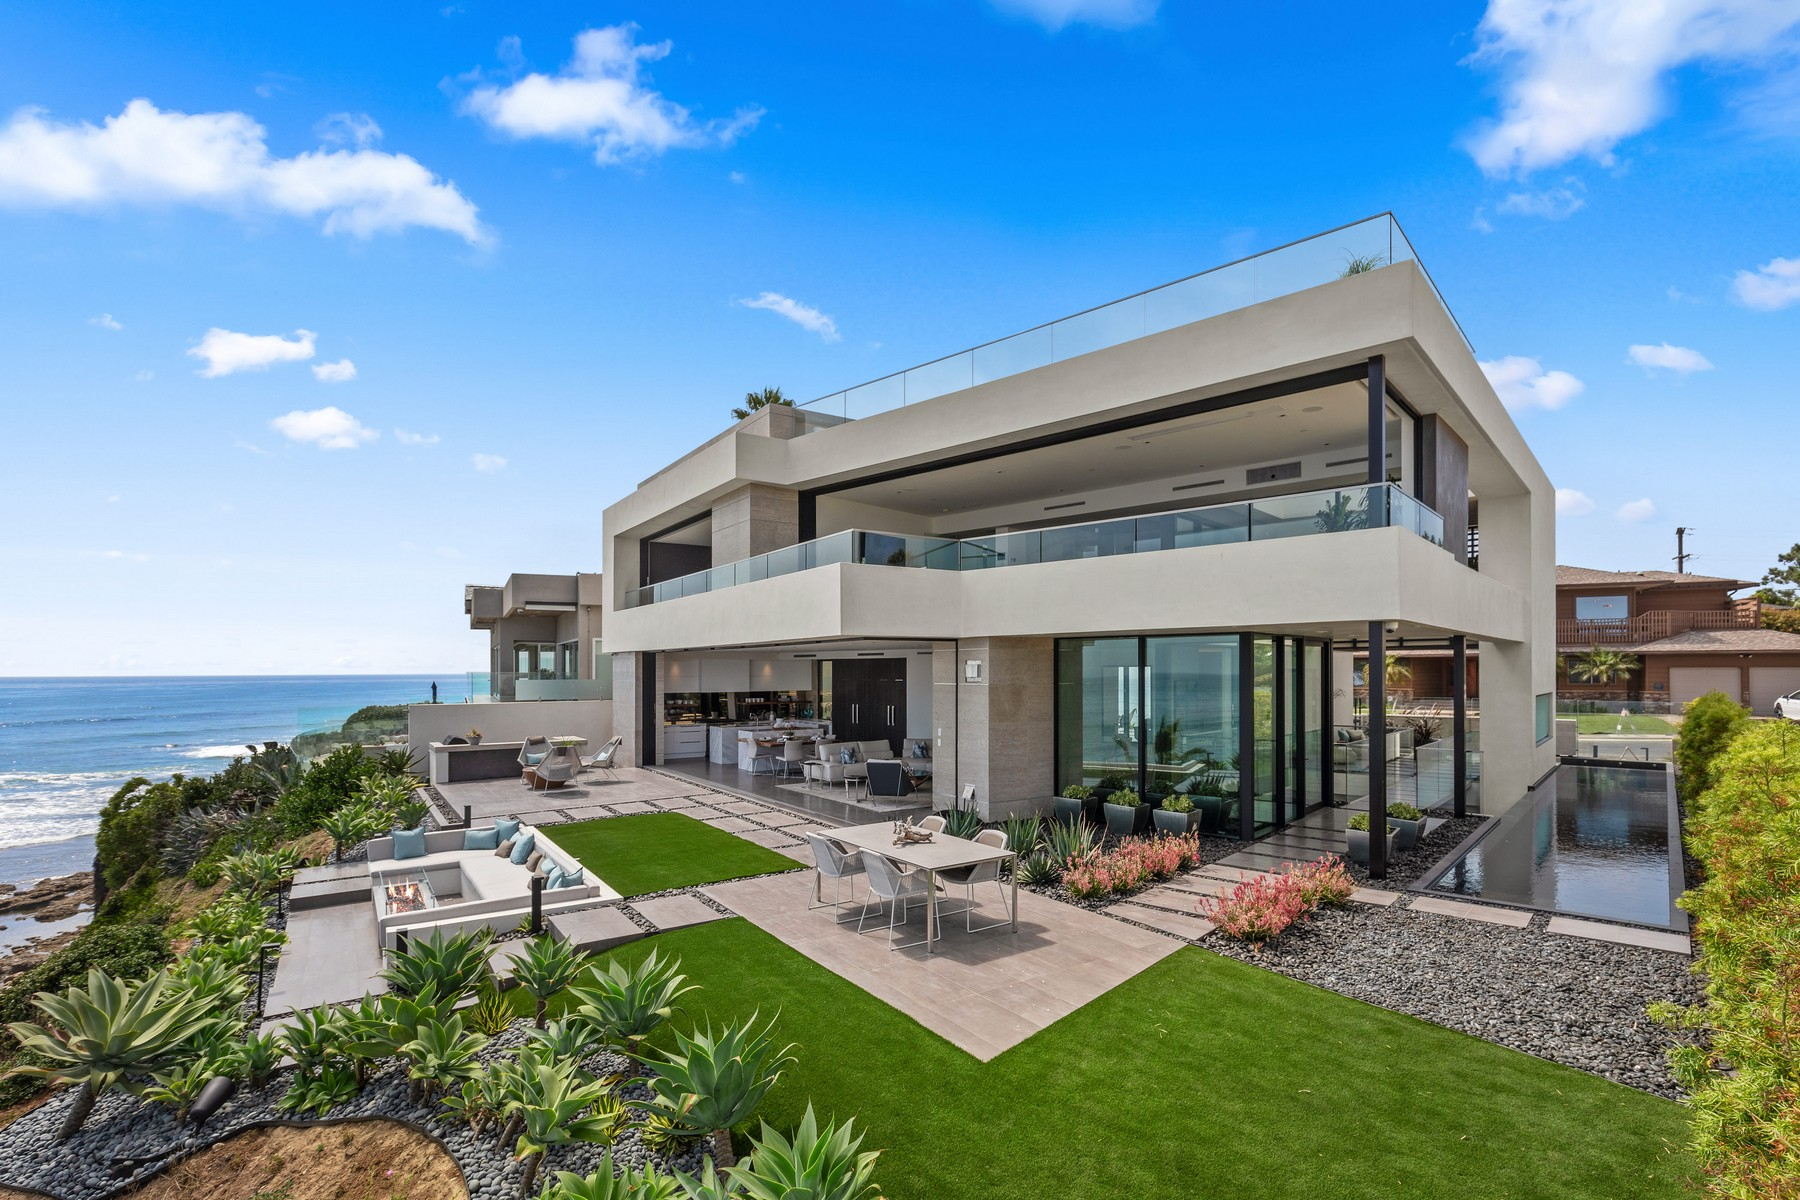 Single Family Homes for Sale at 311 Sea Ridge Dr La Jolla, California 92037 United States